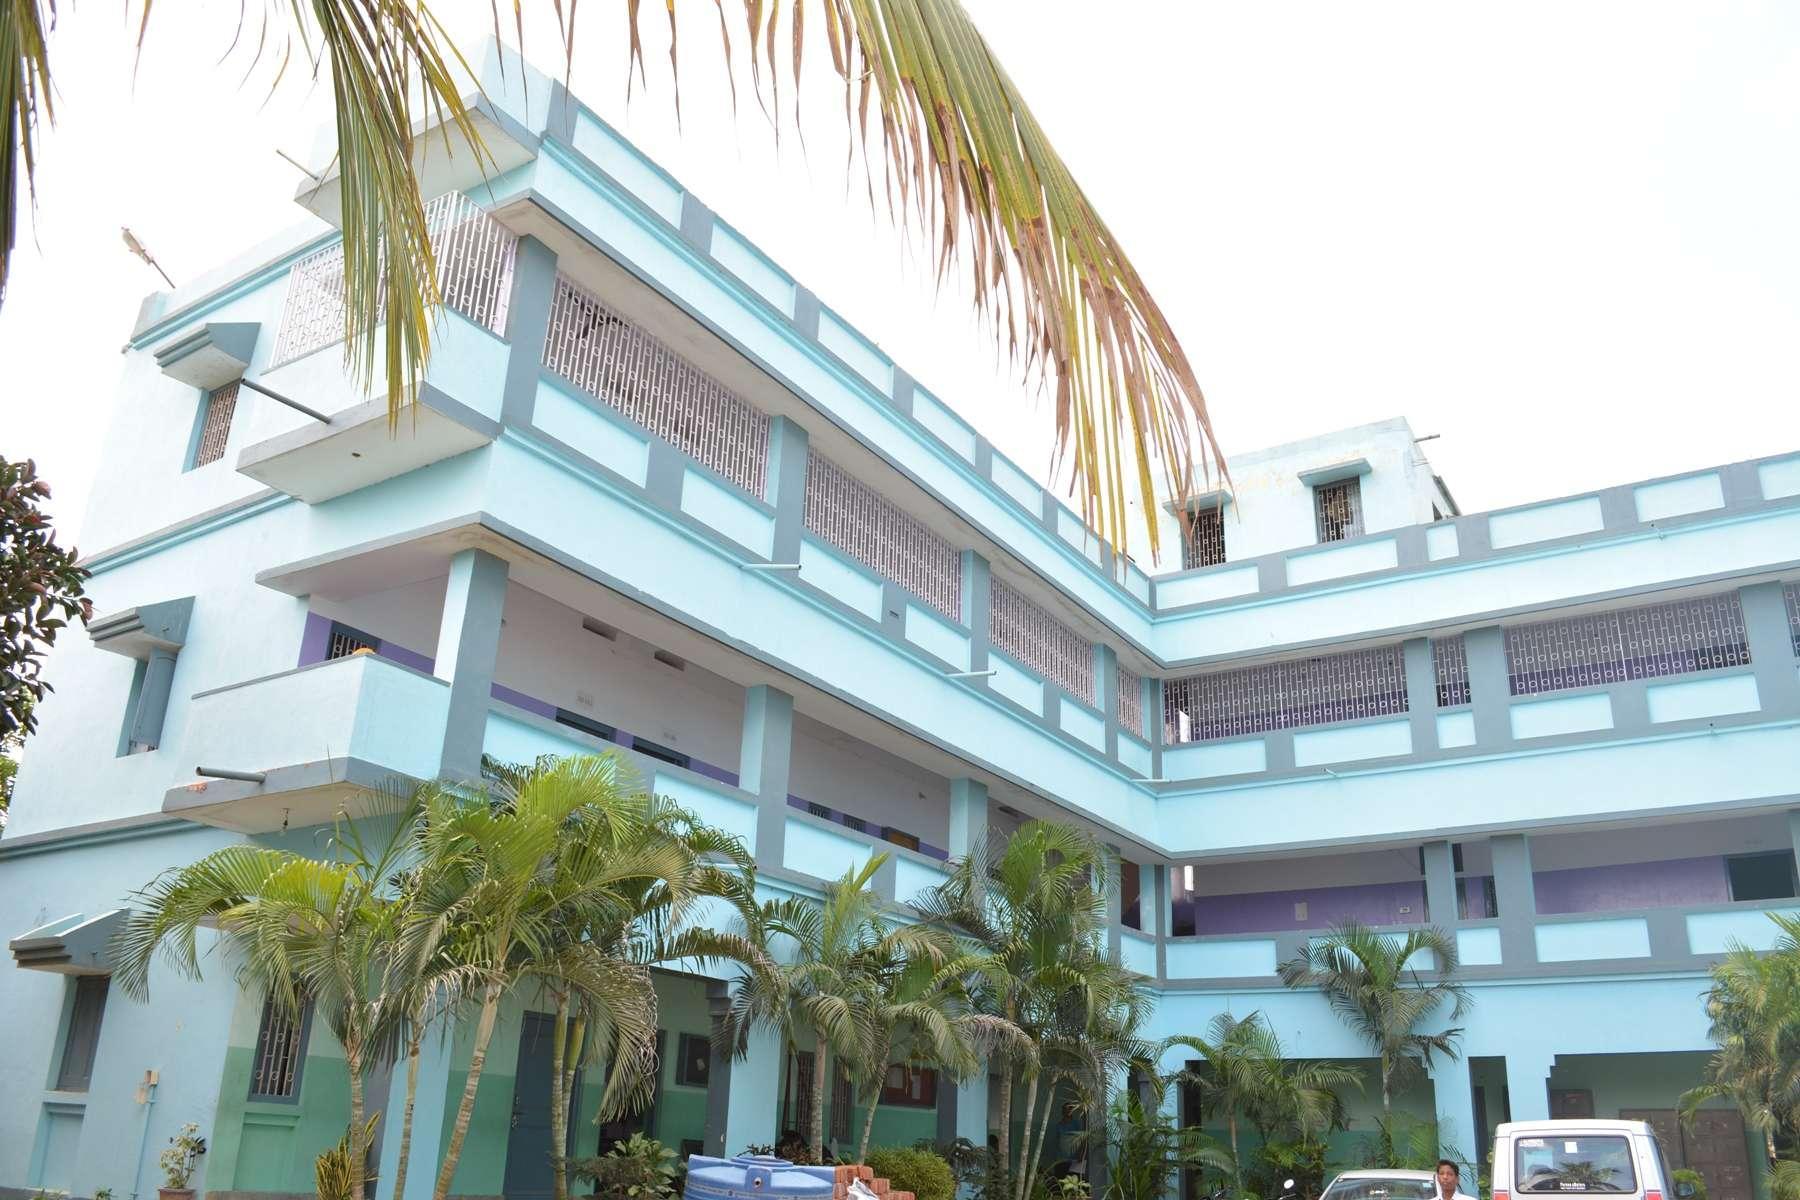 SECONDARY DELHI PUBLIC SCHOOL SHAHID BHAGAT SINGH COLONY MUSTAFABAD GAYA BIHAR 330110